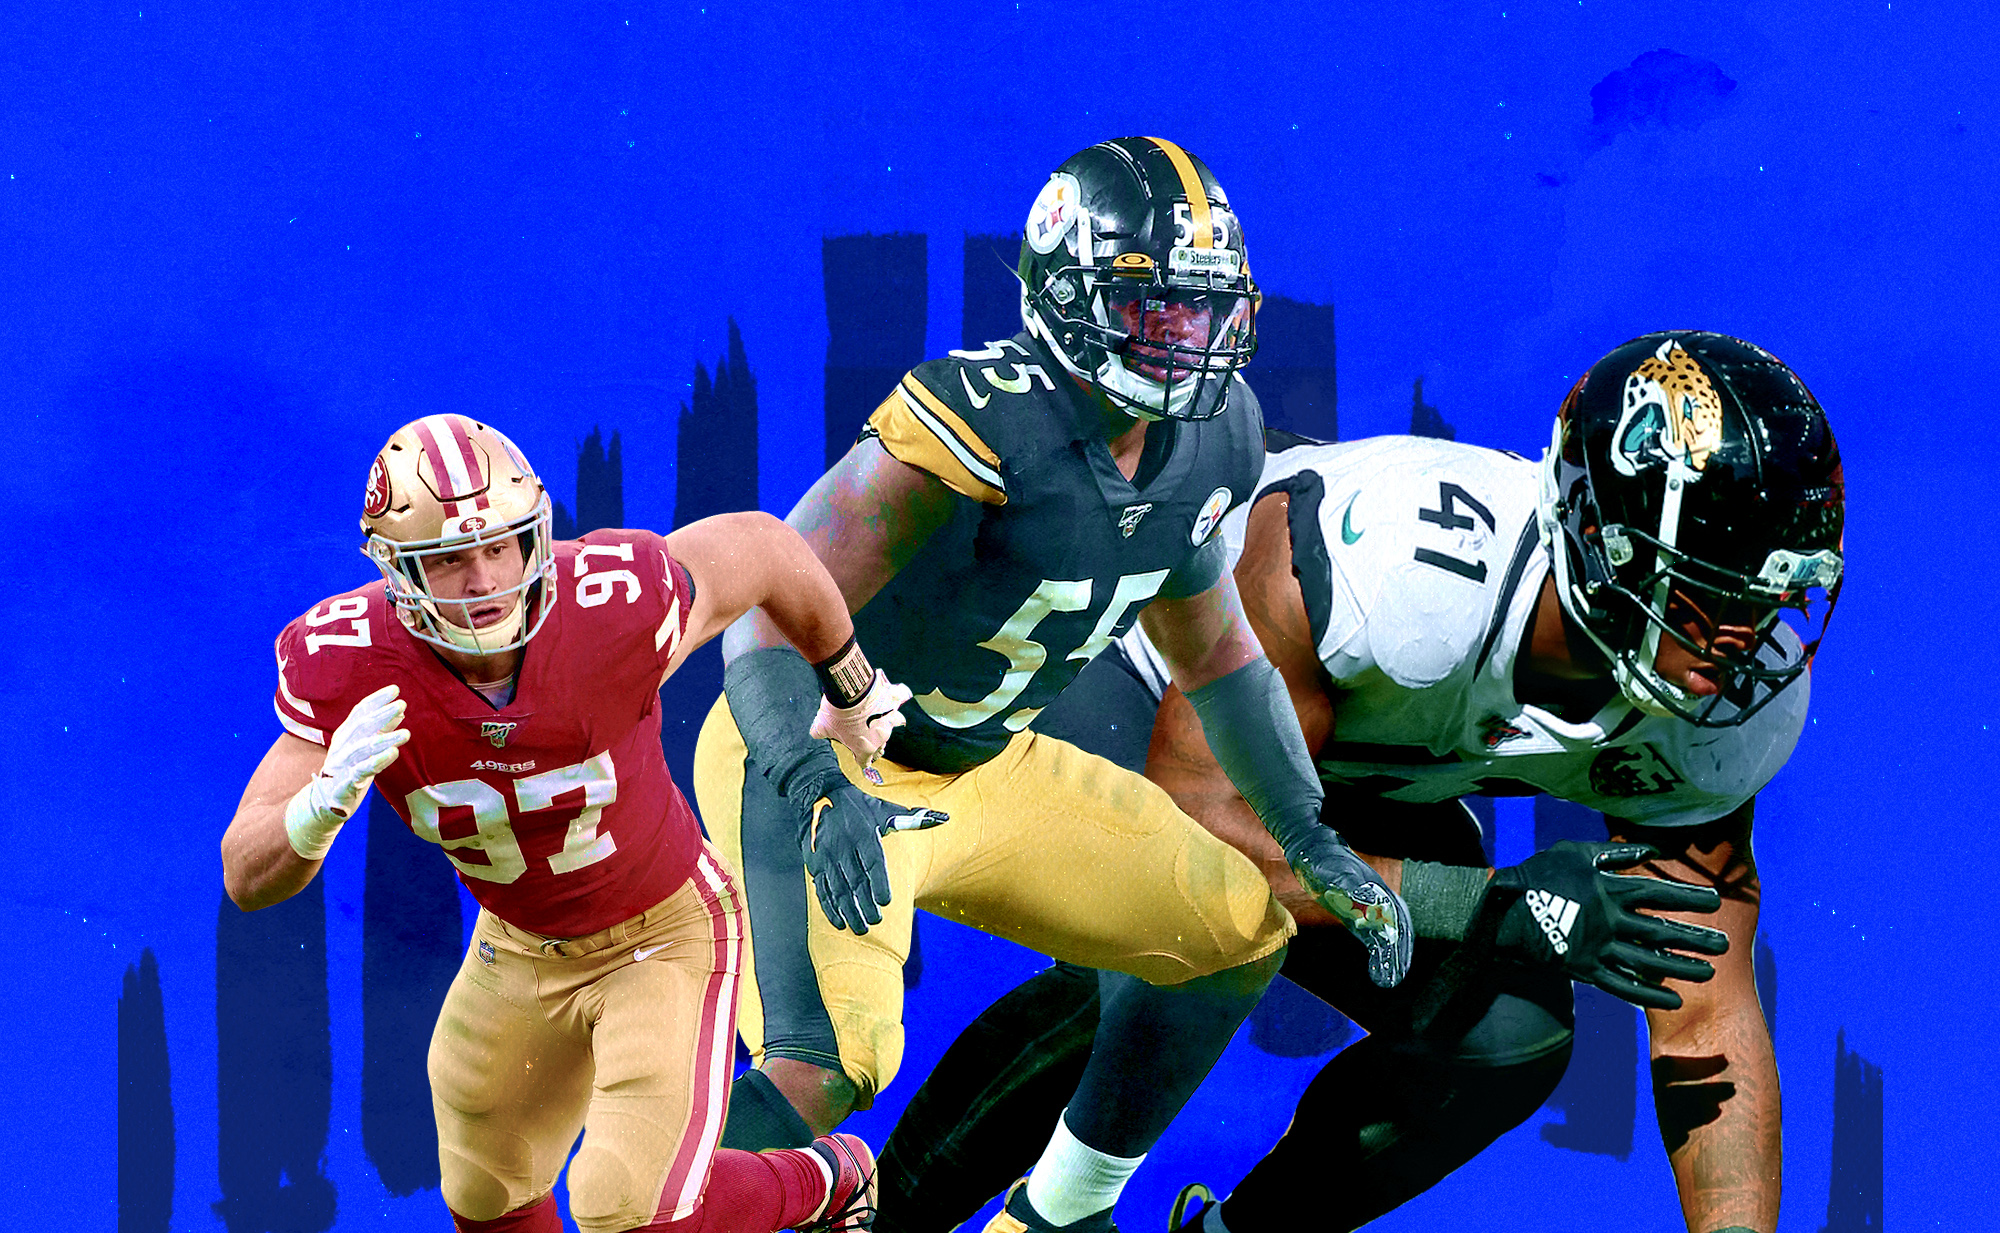 A collage of rookies Nick Bosa (49ers DE), Devin Bush (Steelers LB), and Josh Allen (Jaguars DE)